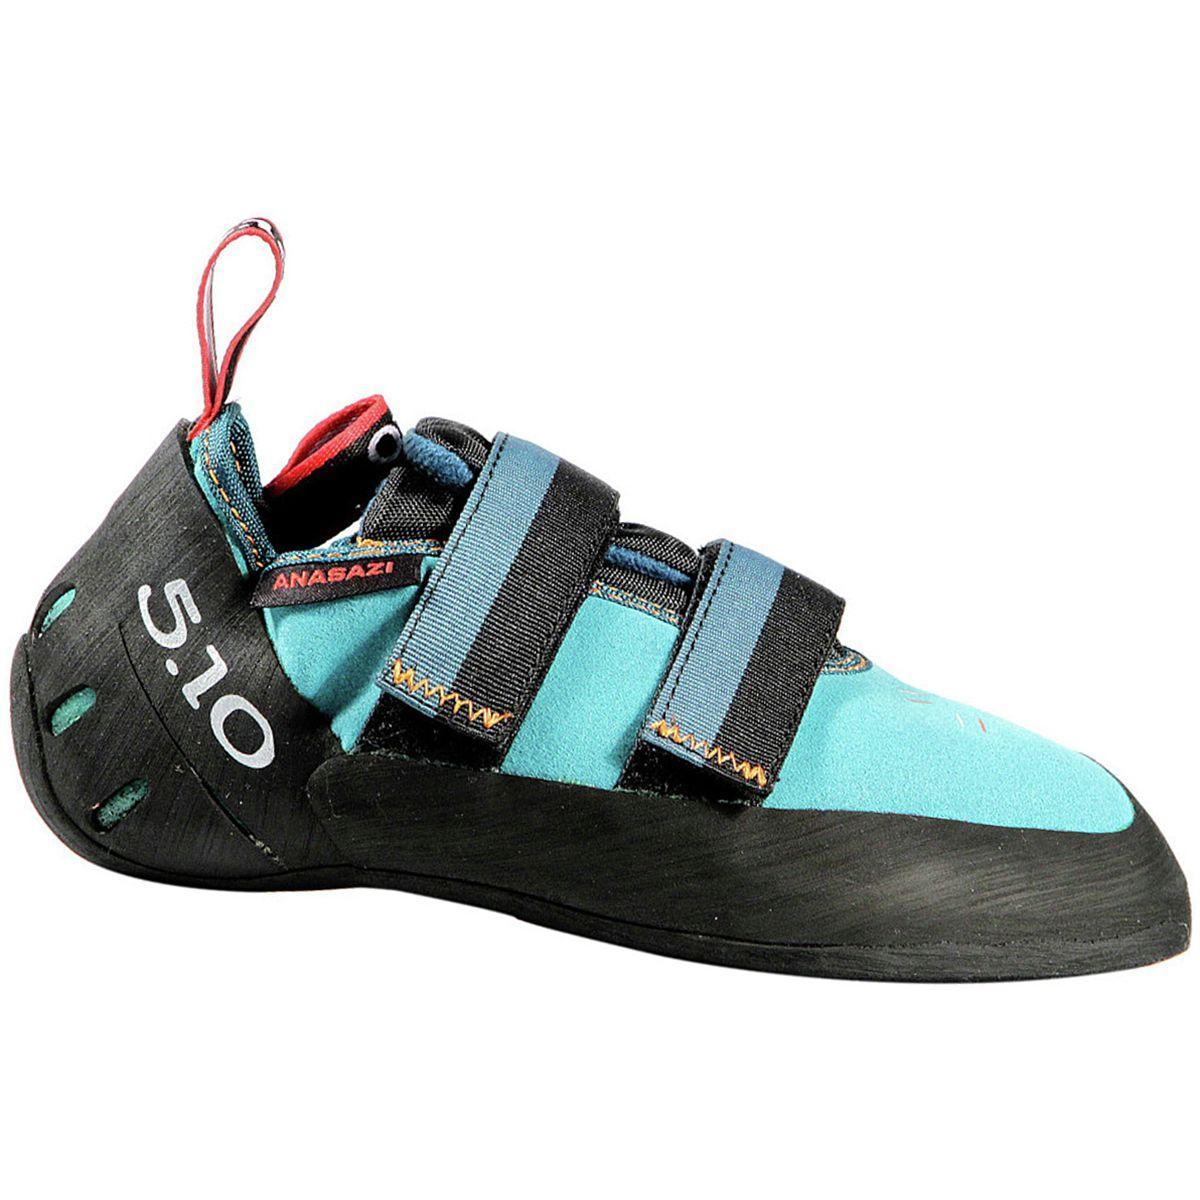 photo: Five Ten Anasazi LV climbing shoe